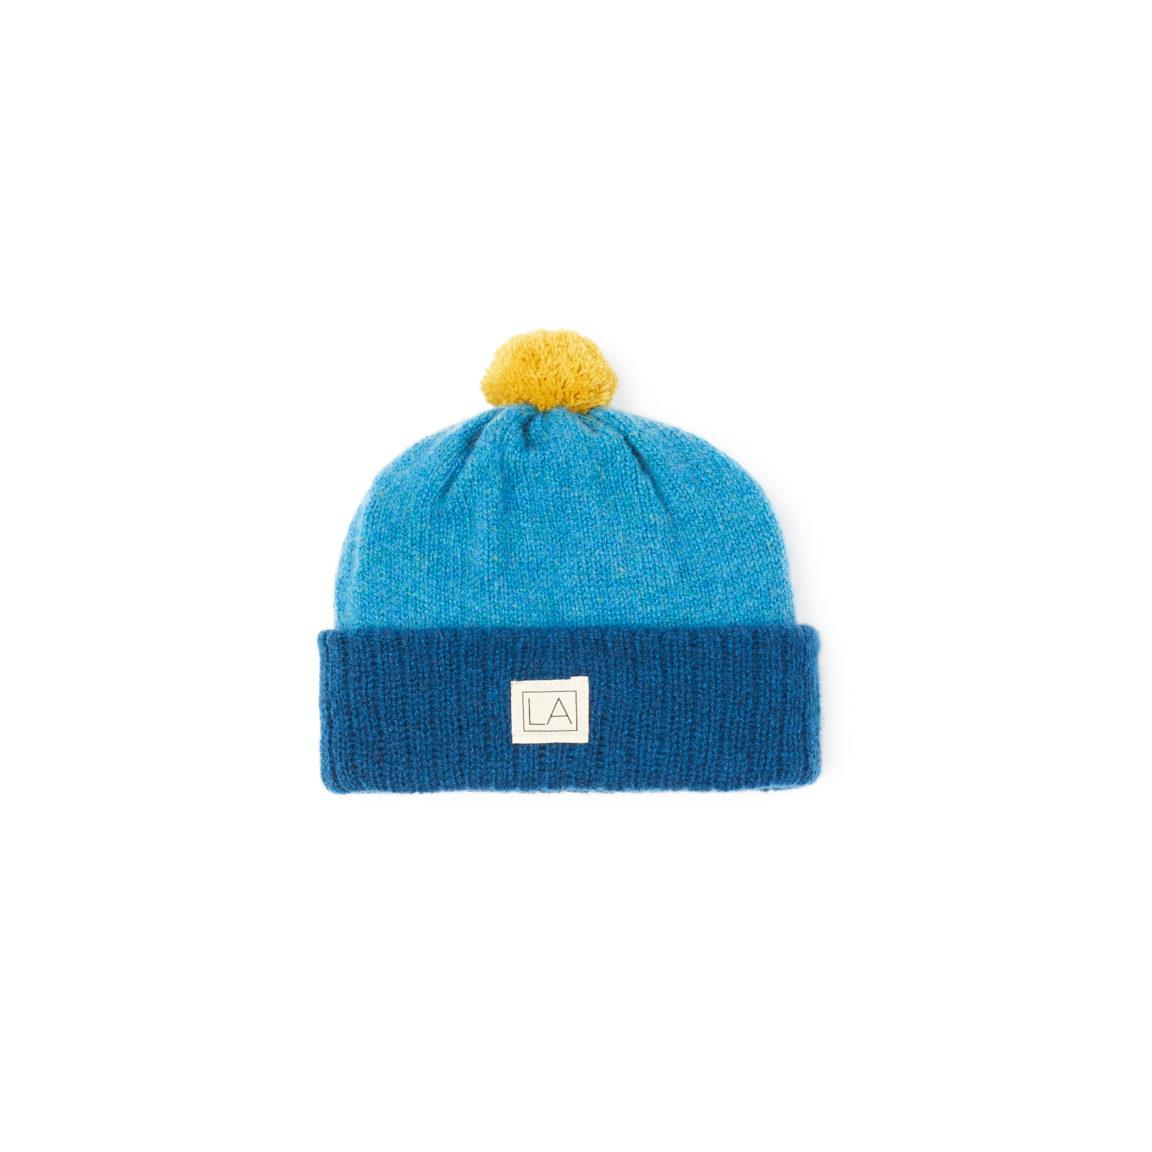 0606ba3fe8d Blue Teal Childrens Hat Soft Lambswool sustainable irish design handmade